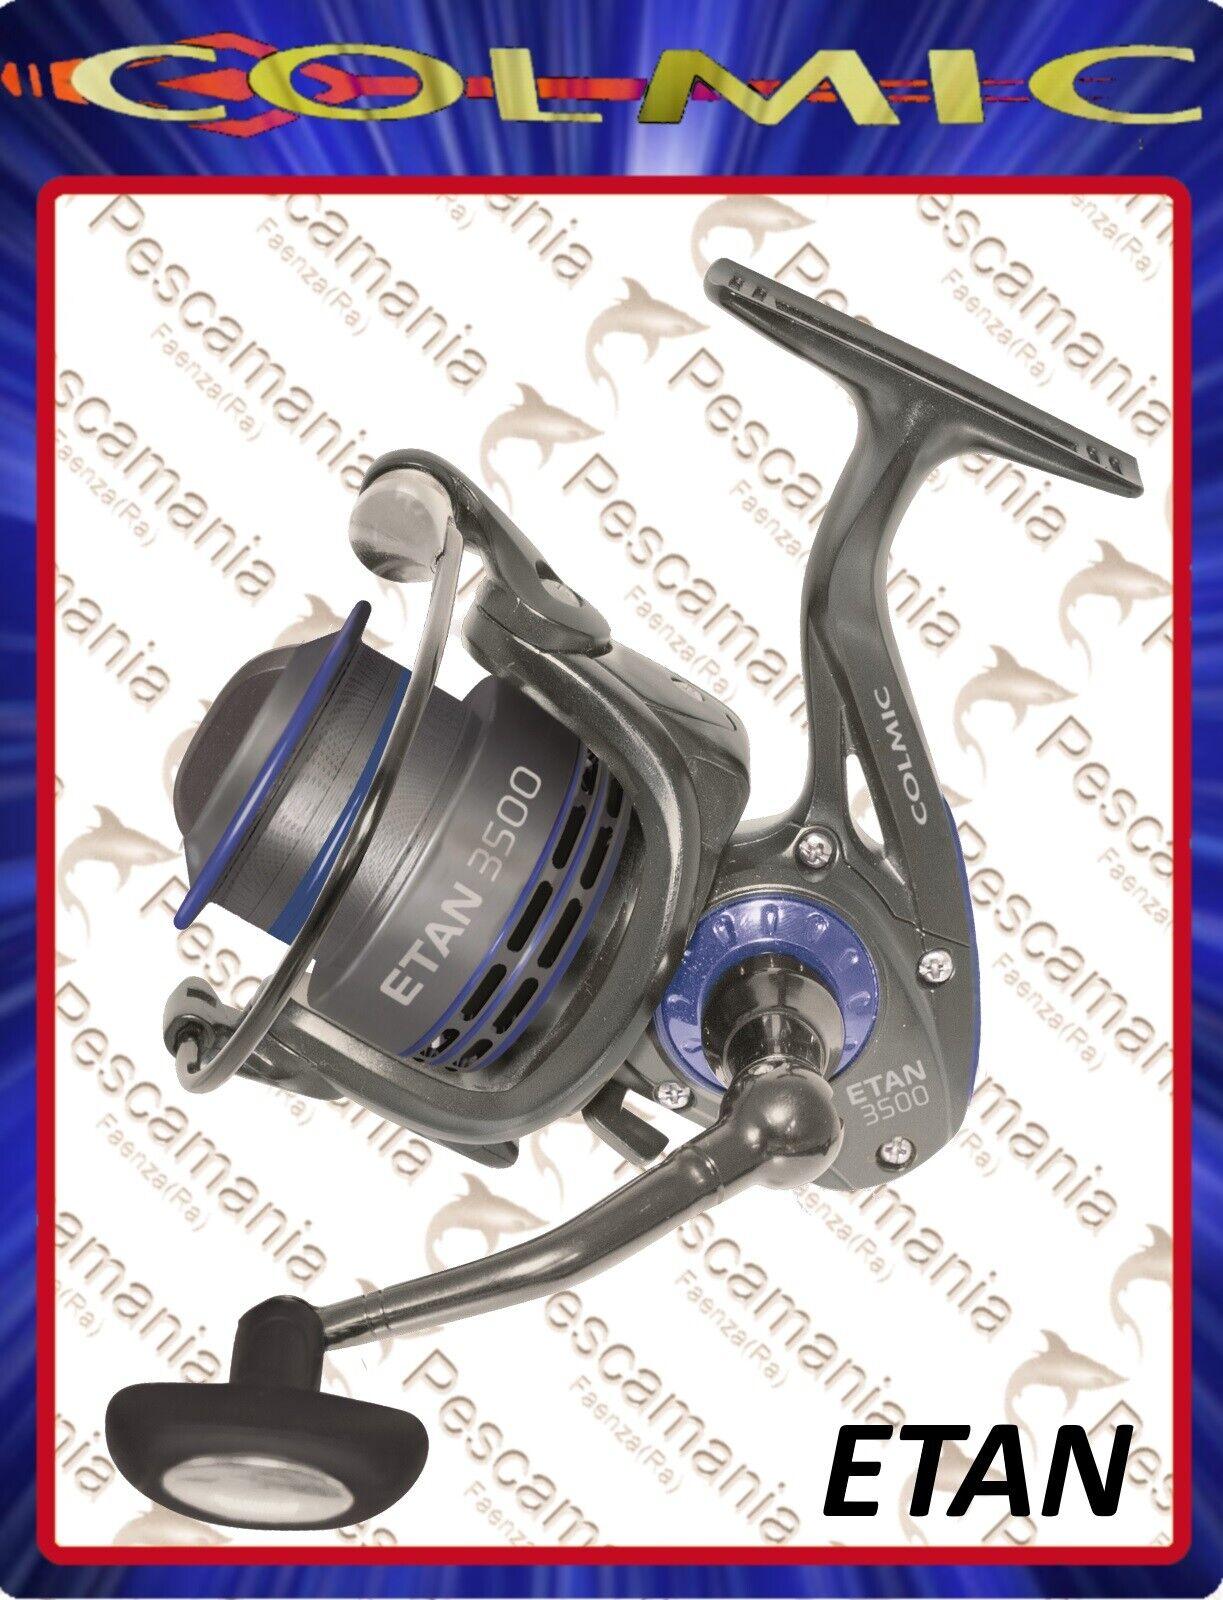 Mulinello Colmic ETAN 2500-3500-5000 spinning bolo match fishing feeder 8+1BB